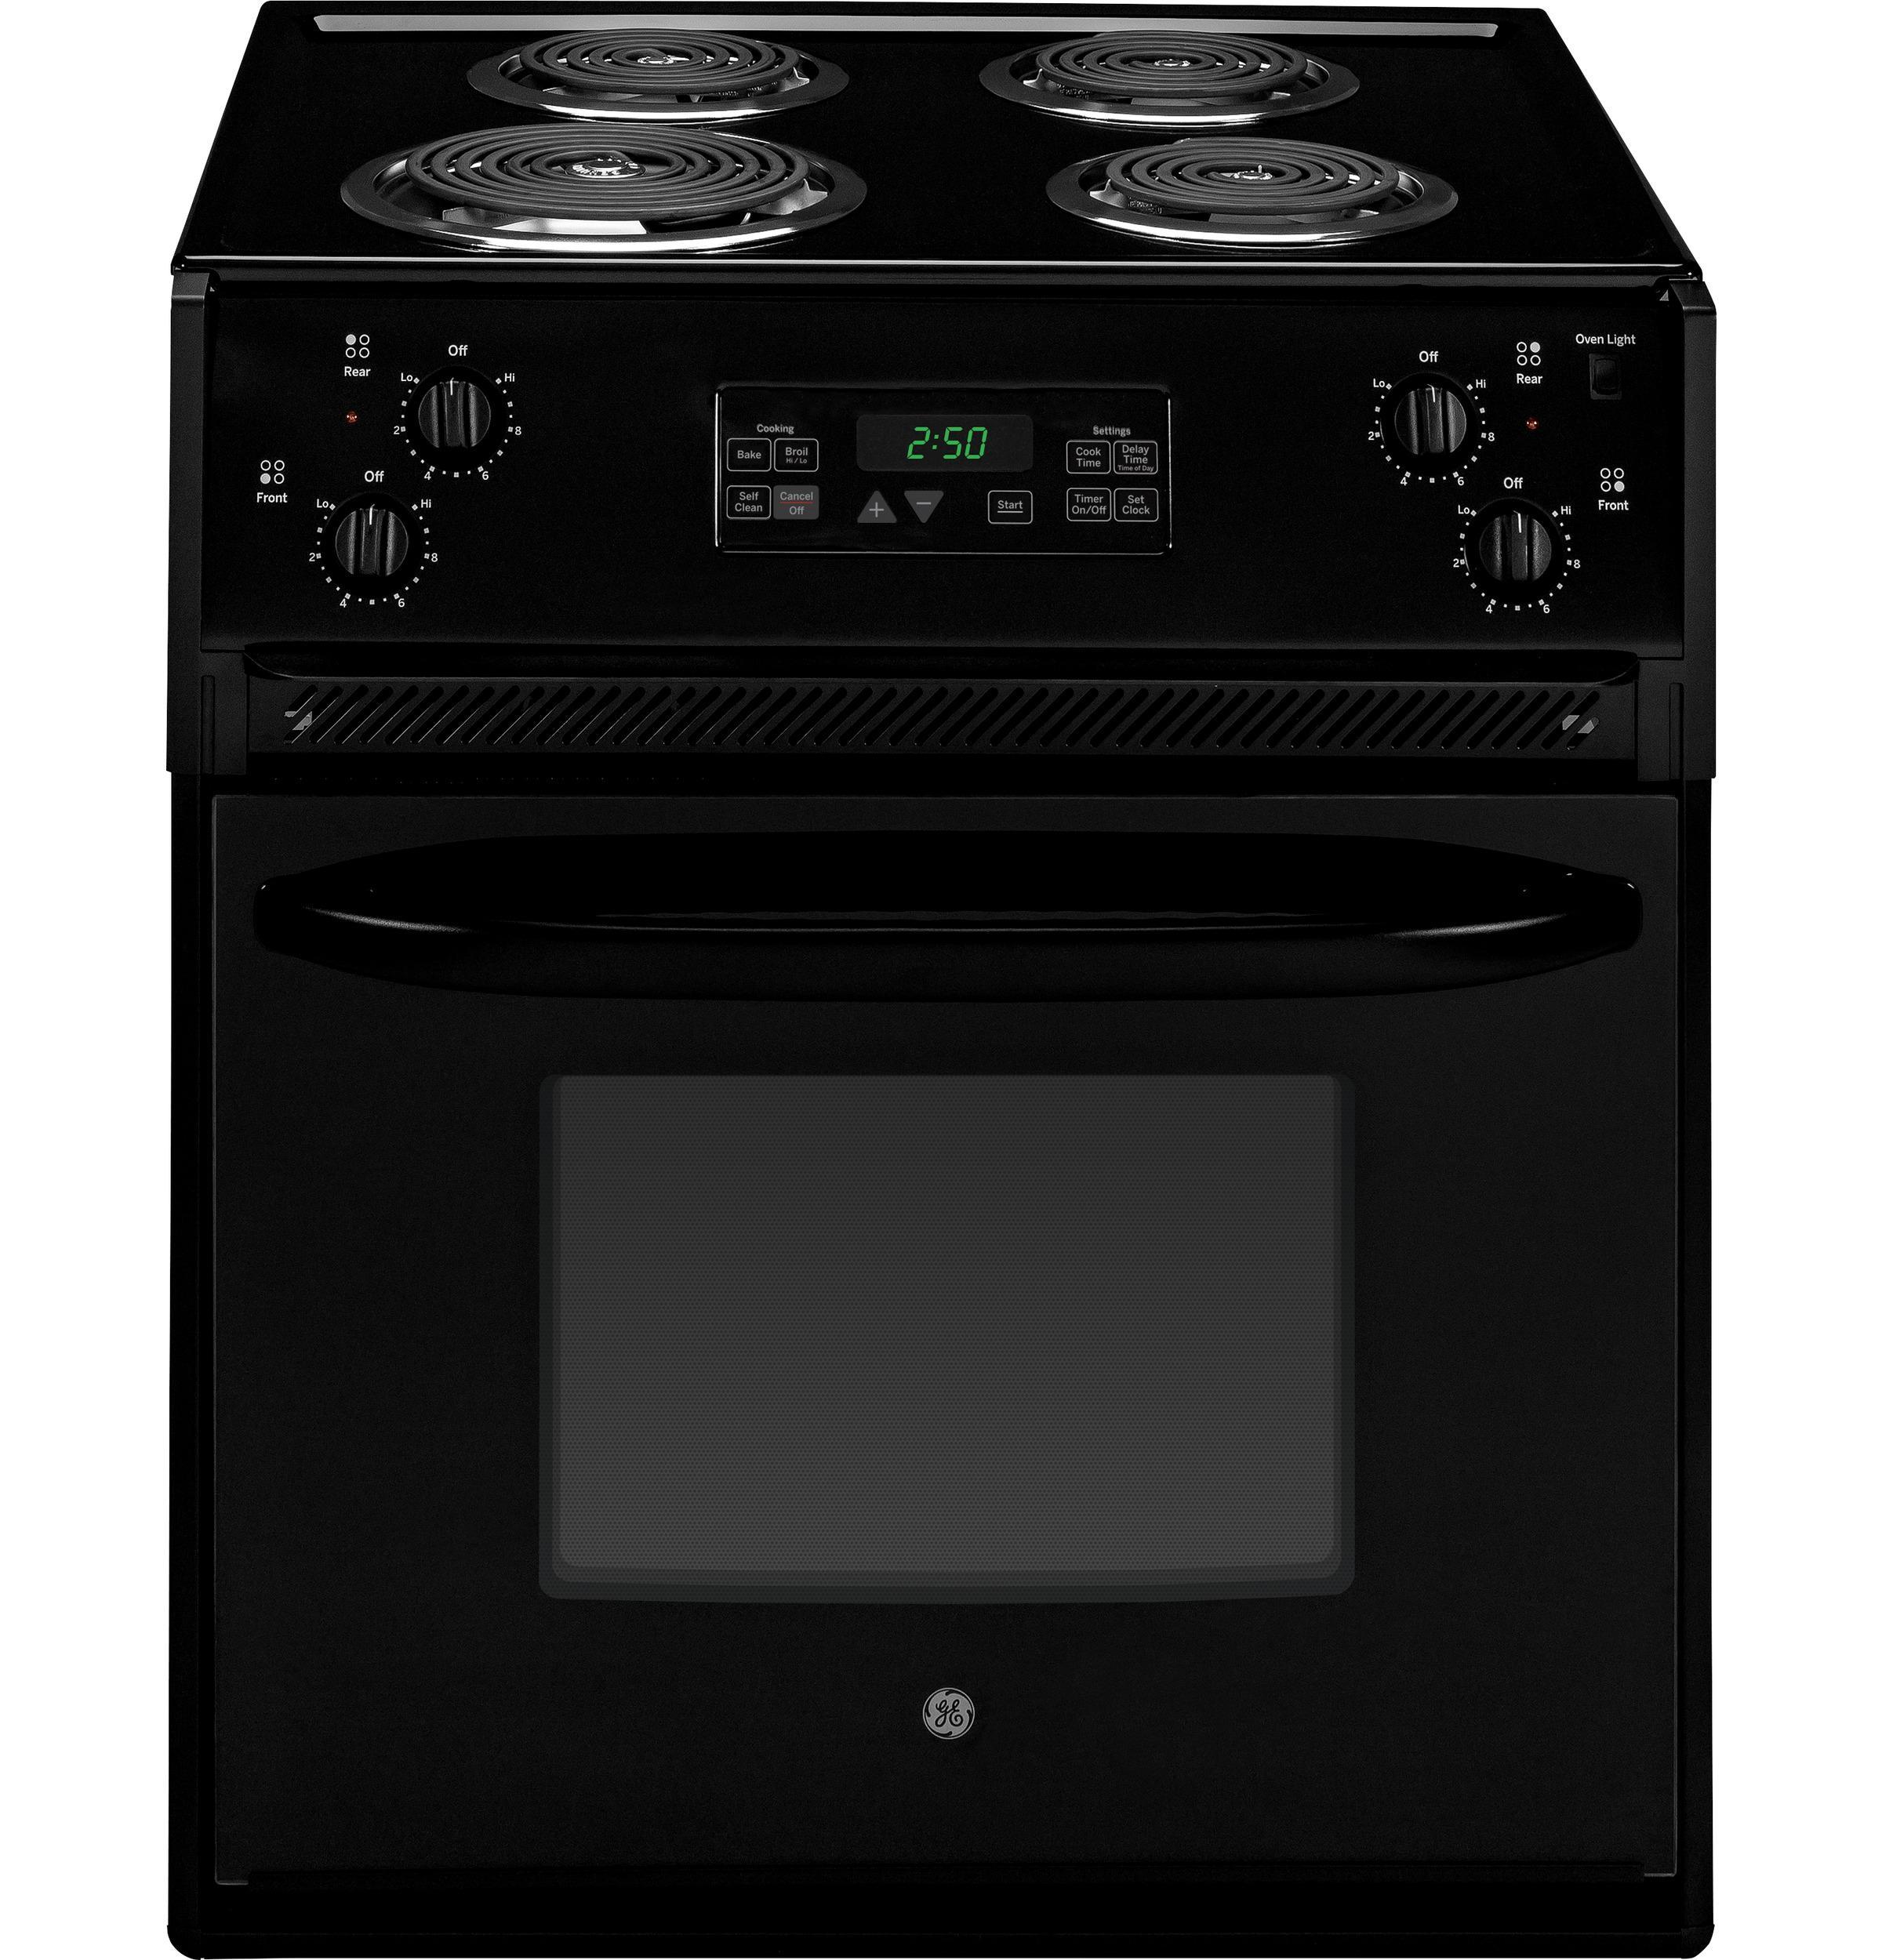 "GE Appliances Electric Range 27"" Drop-In Electric Range - Item Number: JM250DFBB"